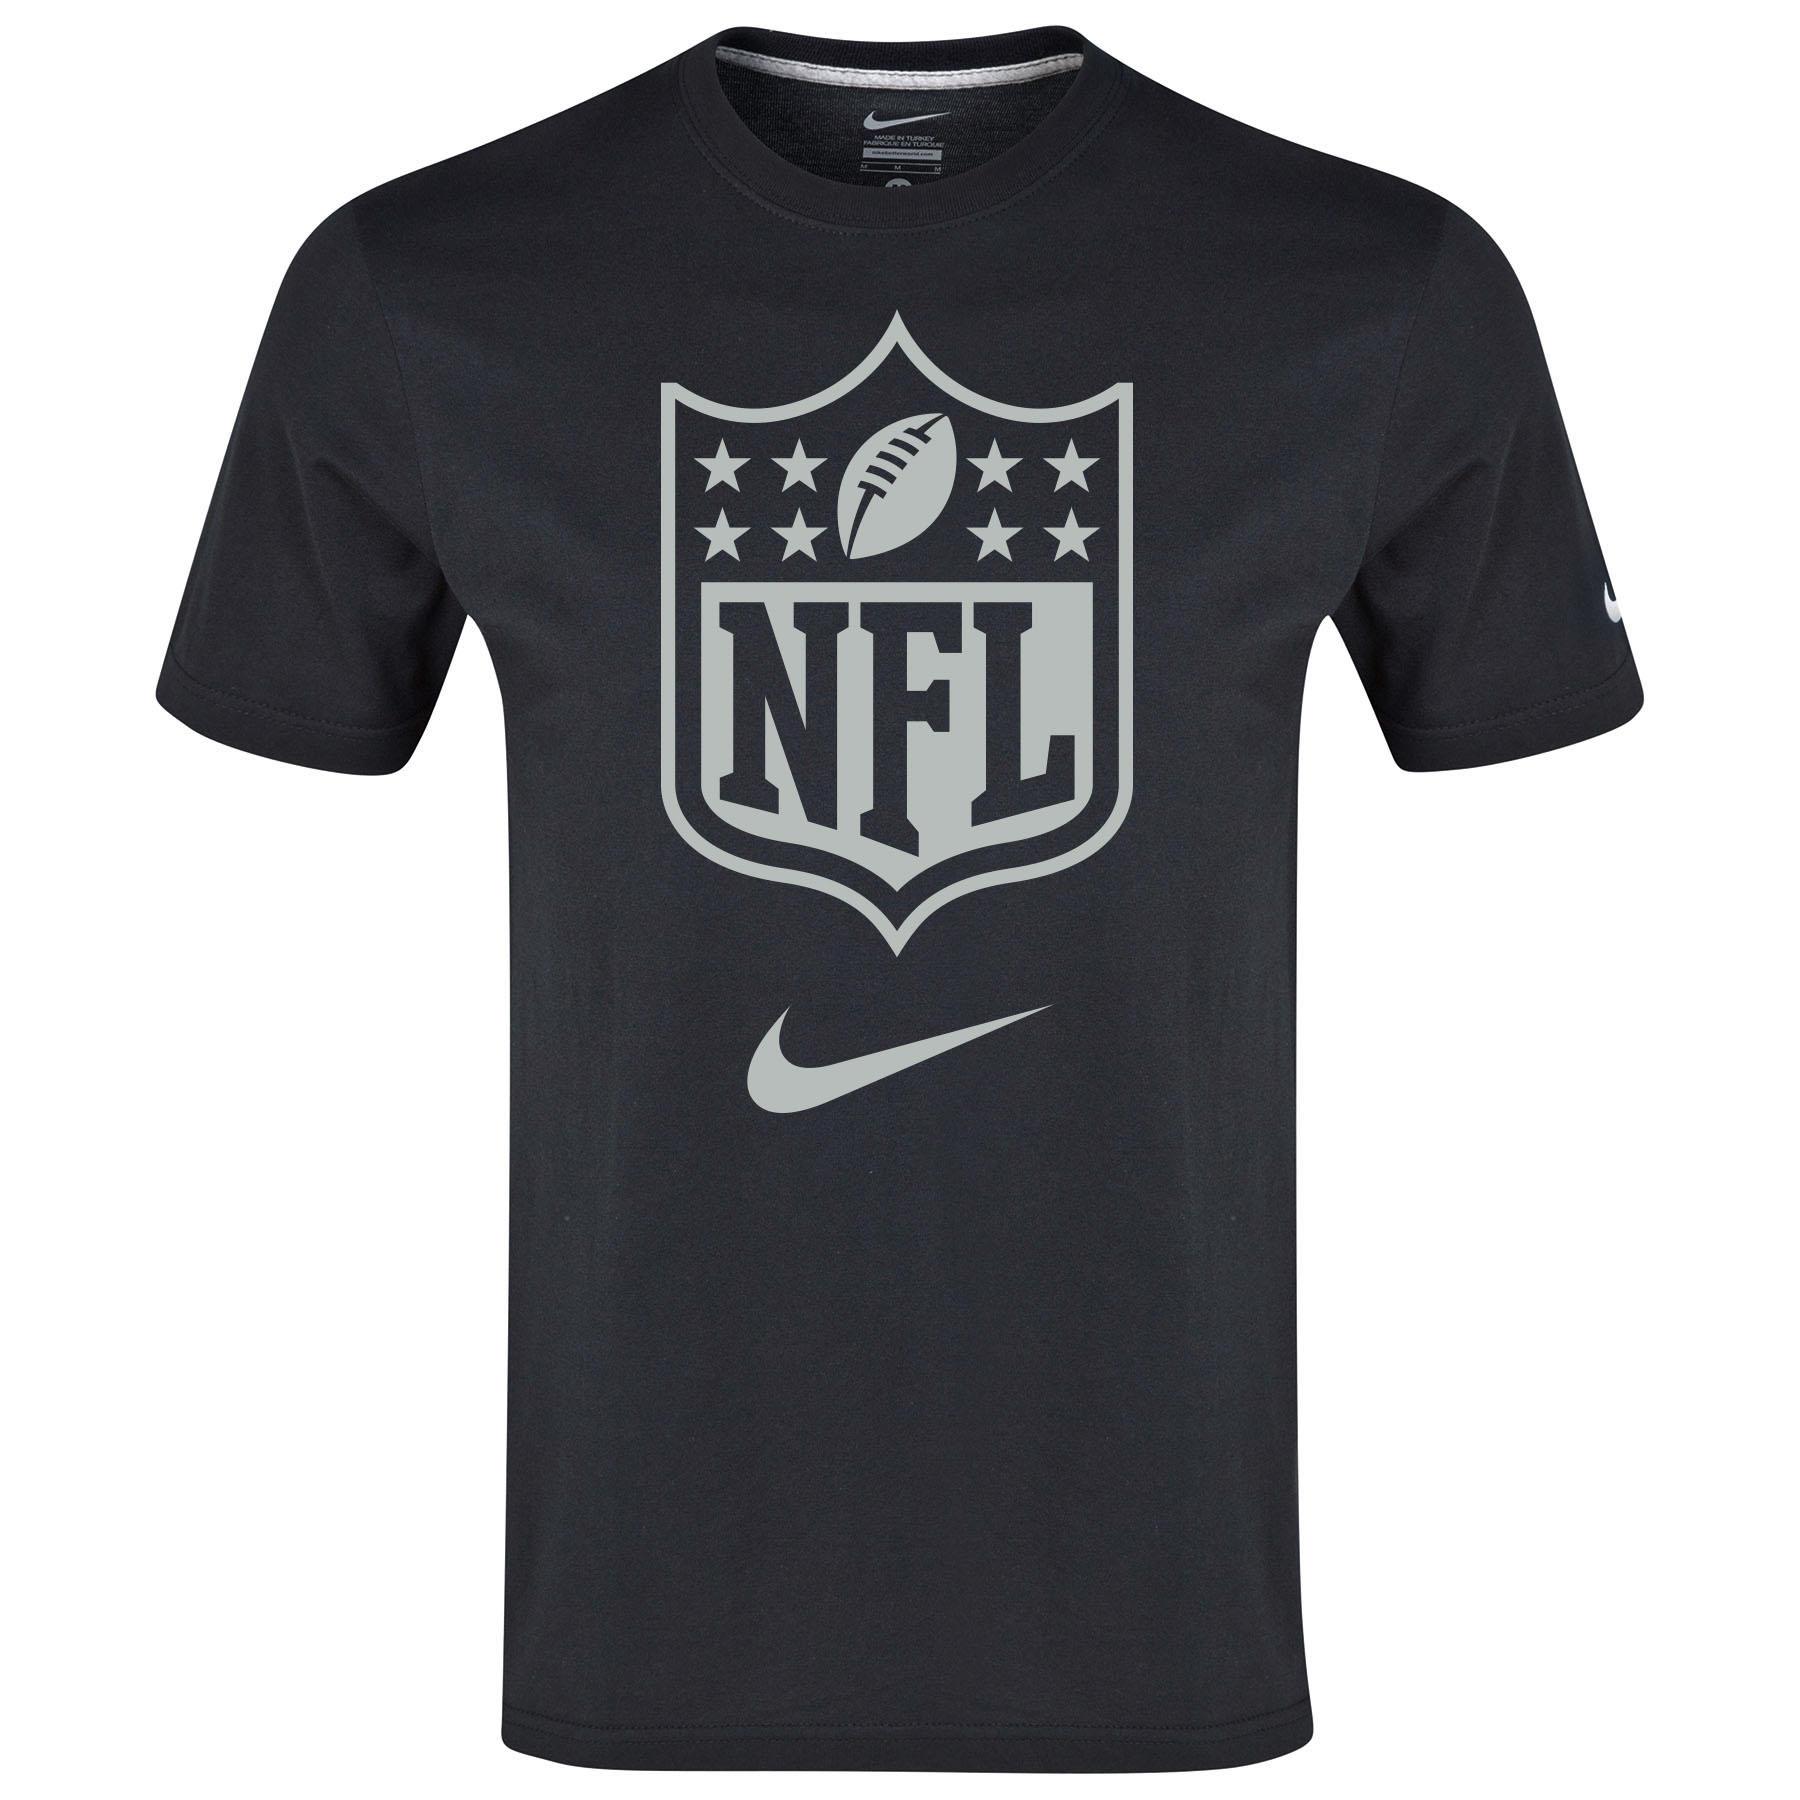 NFL Shield T-Shirt Black